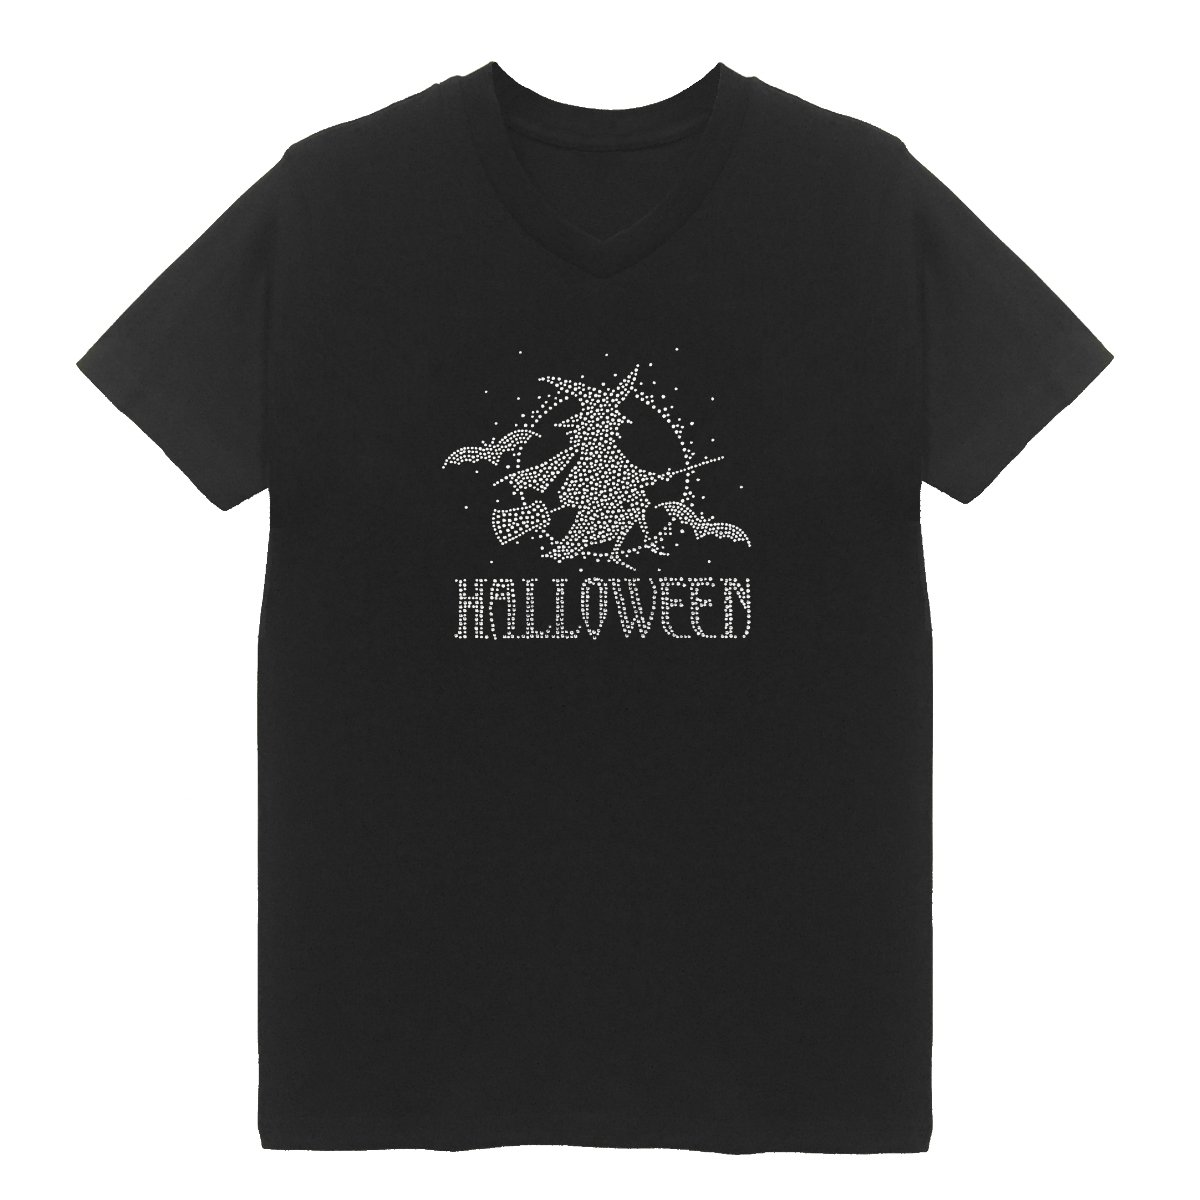 HappymomShirts Halloween Women's V Neck T-Shirt Plus Size Unisex